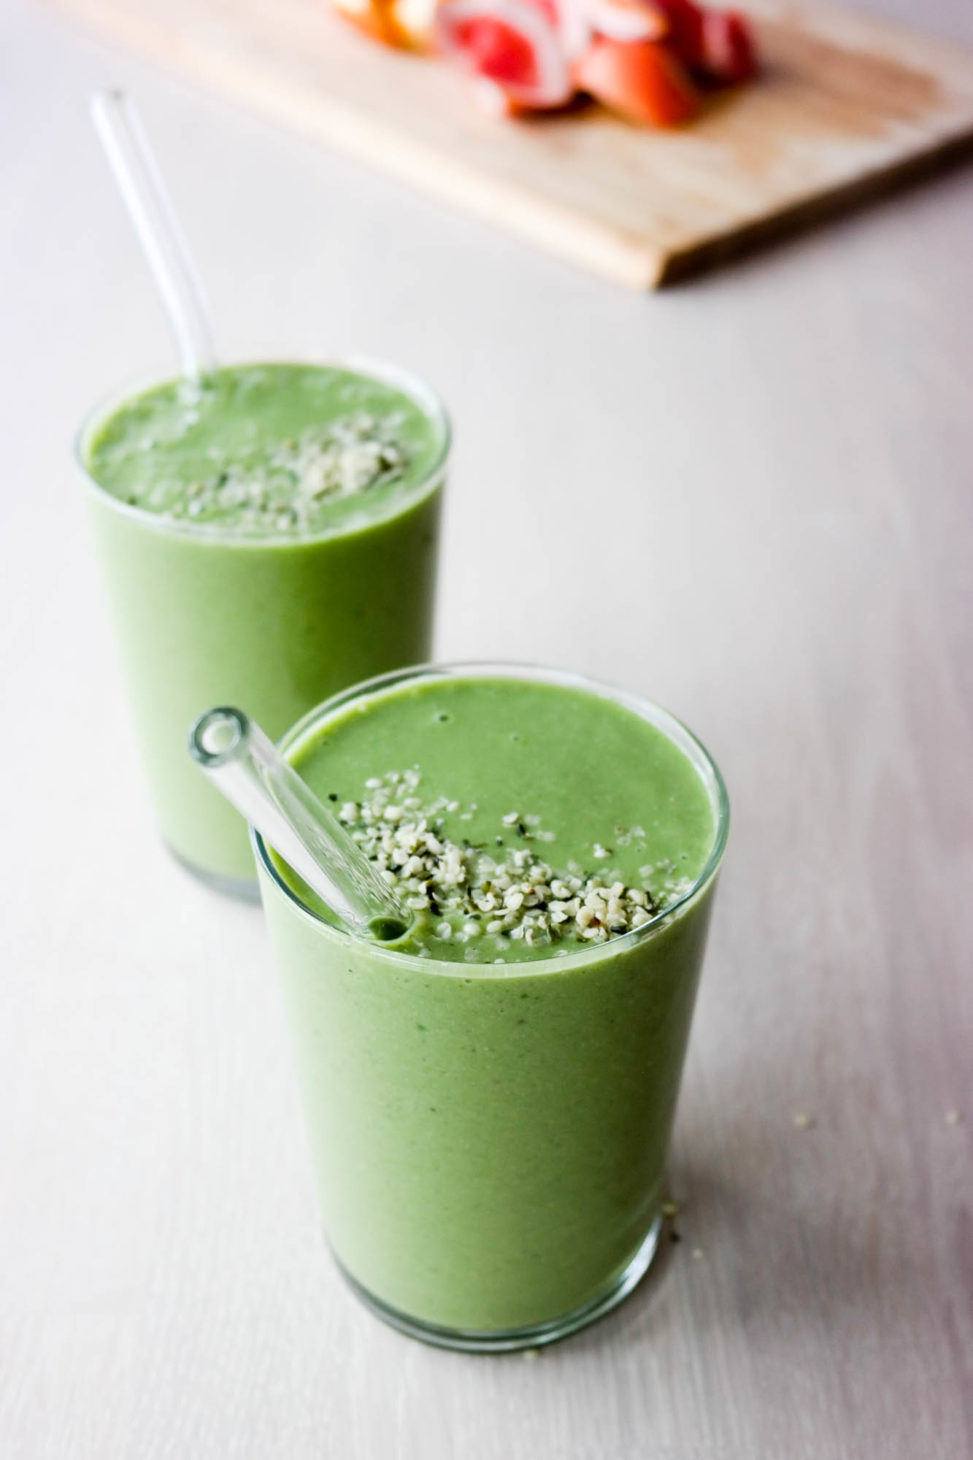 Start dagen med en frisk, syrlig og næringsrik smoothie!